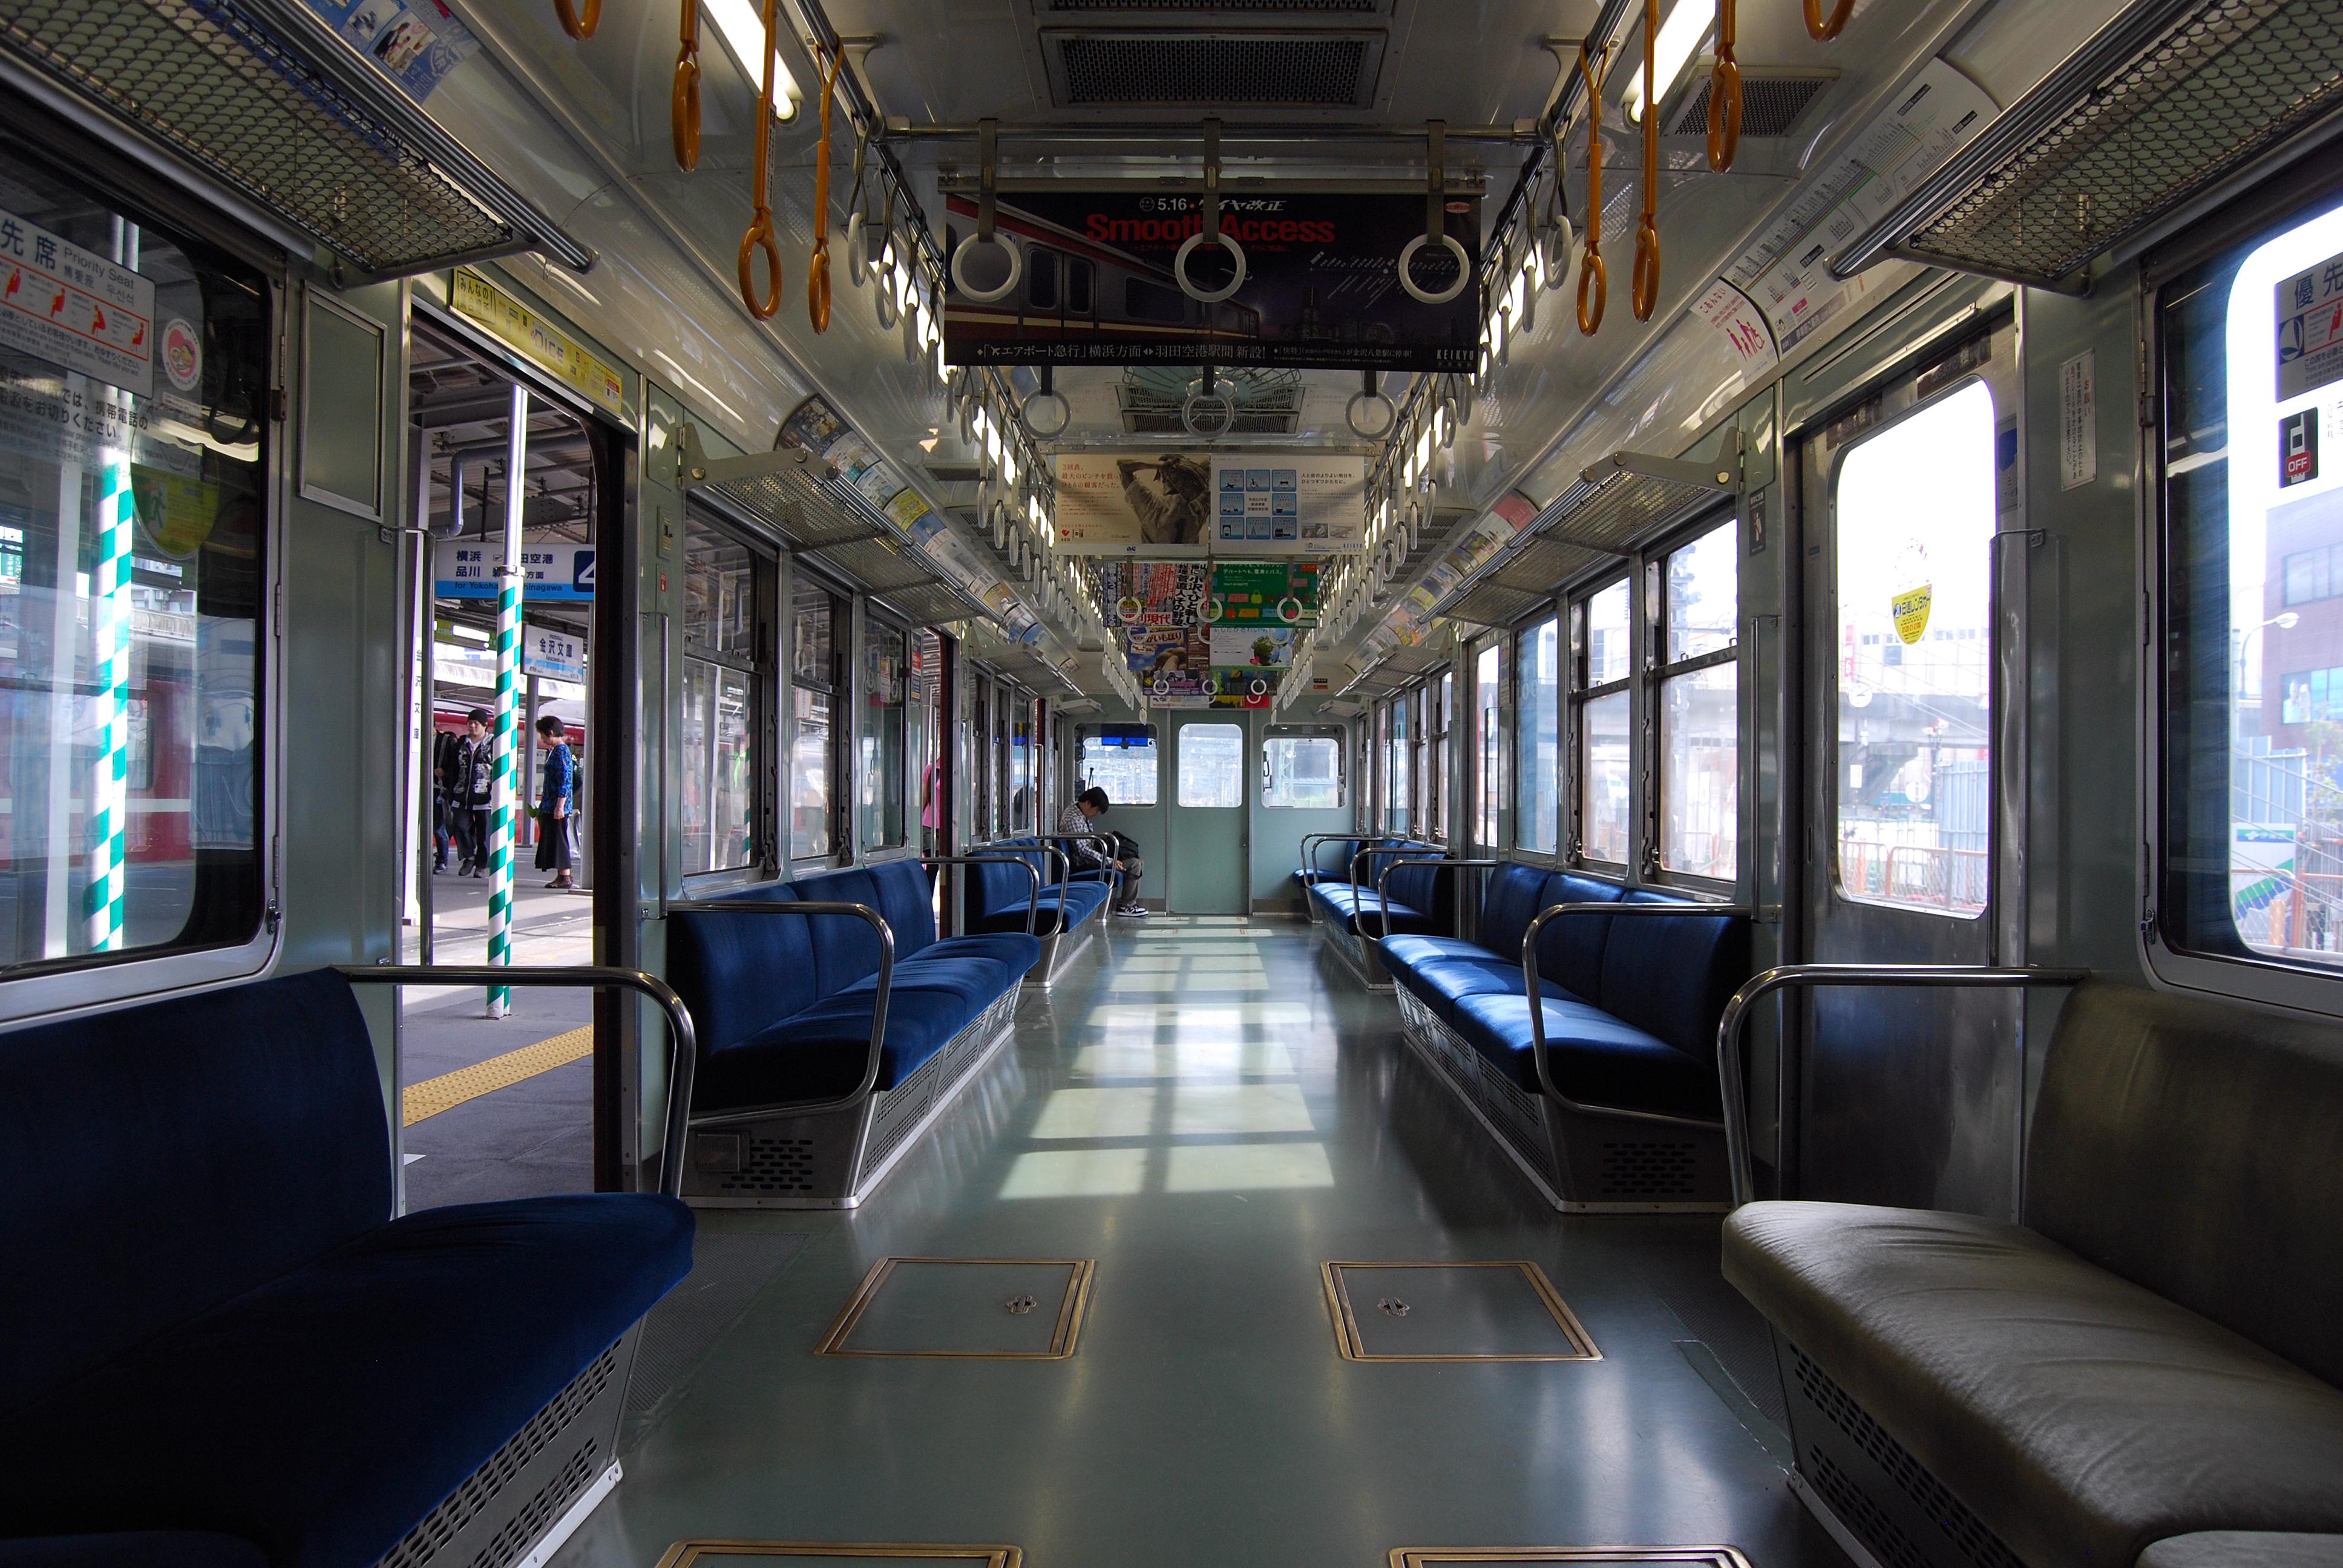 https://upload.wikimedia.org/wikipedia/commons/f/fd/Keikyu_1000kei_syanai.JPG